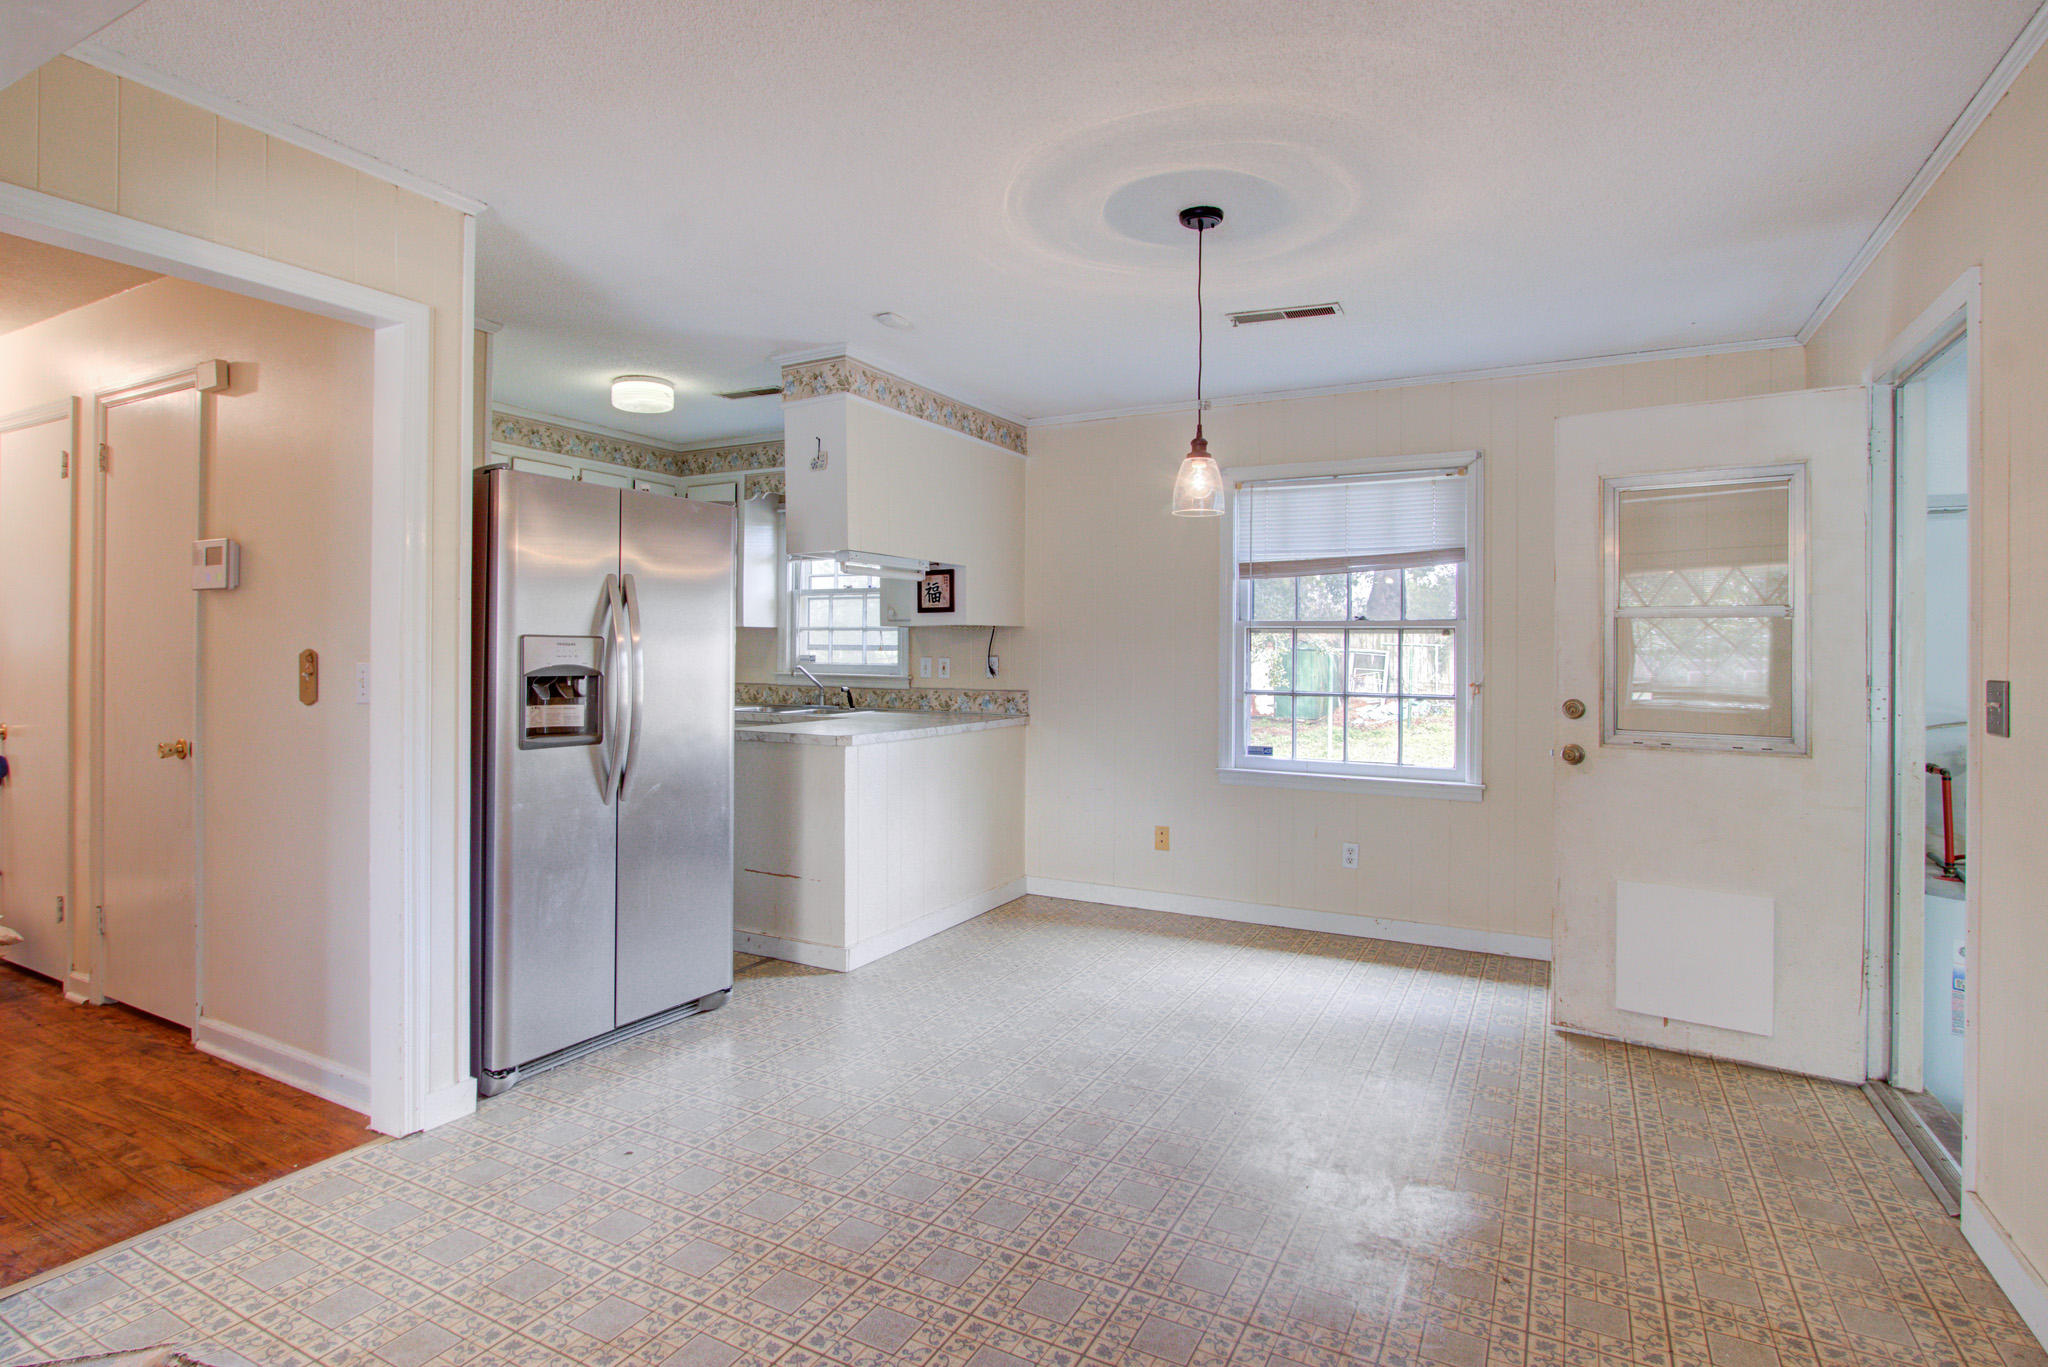 Bushy Park Terrace Homes For Sale - 125 Azalea, Goose Creek, SC - 13